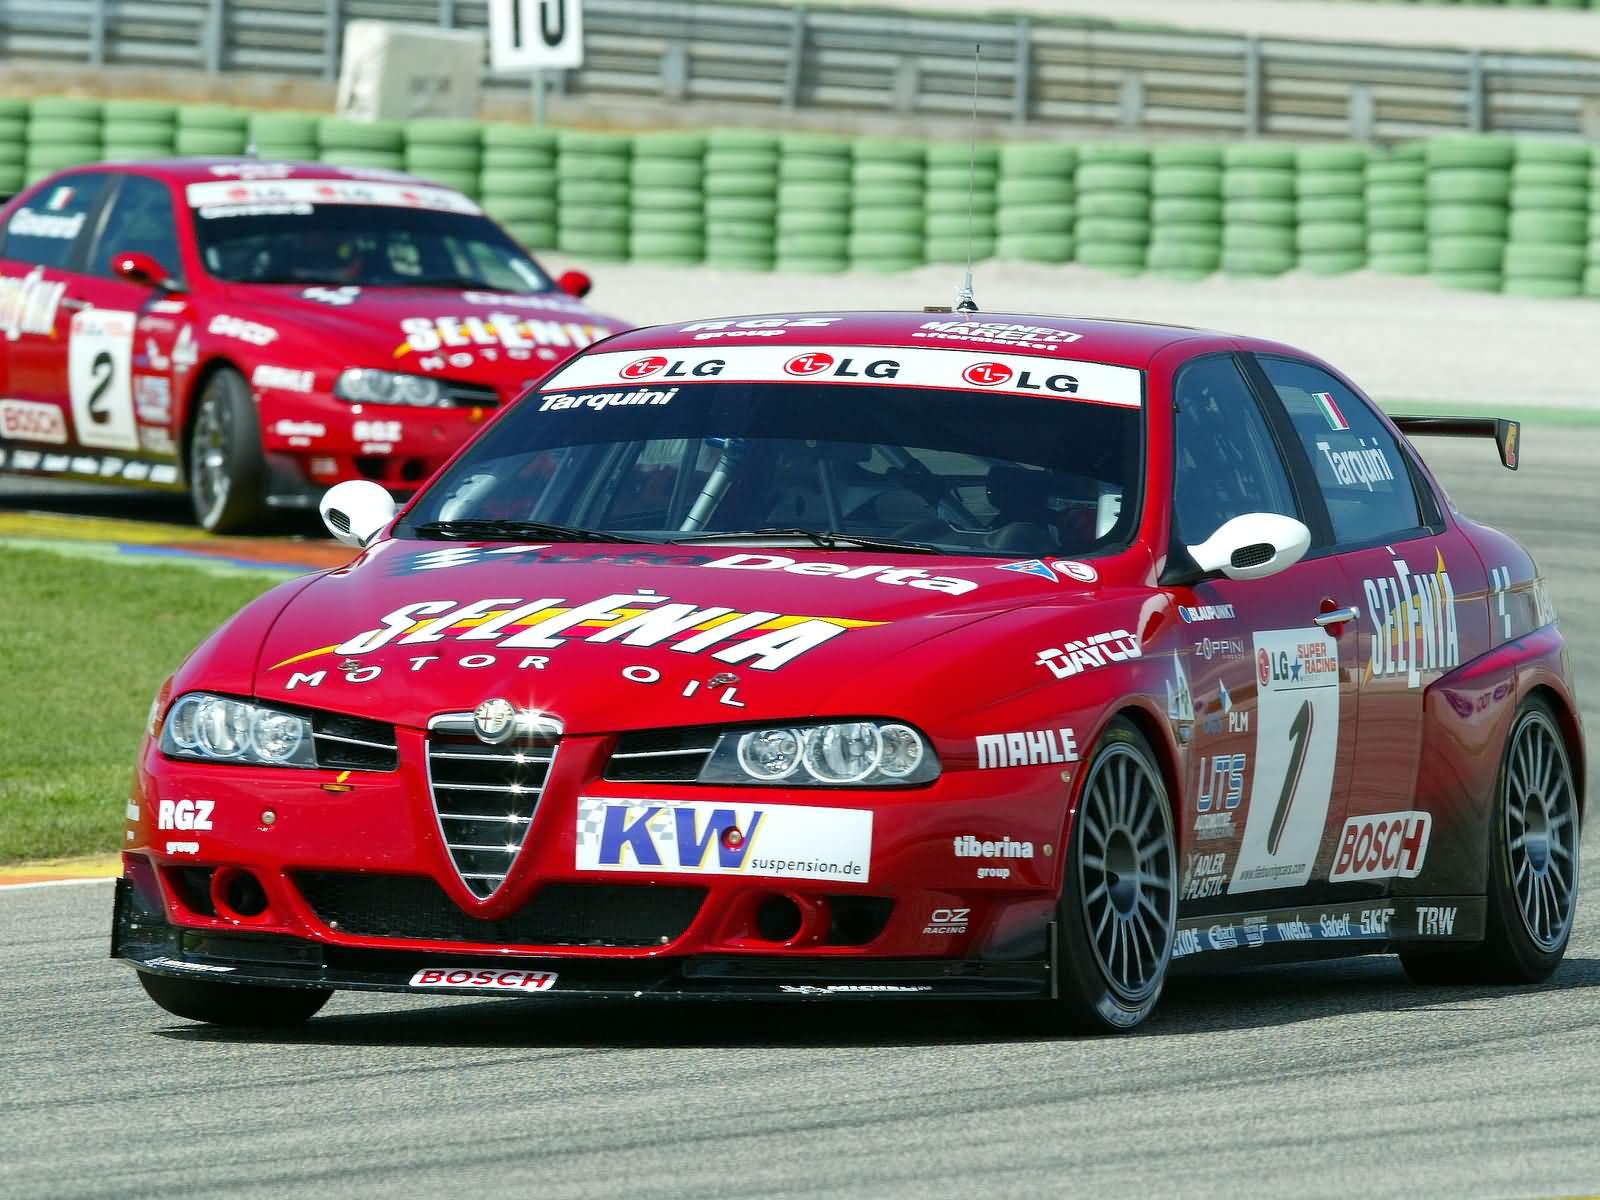 Alfa Romeo 156 Gta Autodelta Picture 11555 Alfa Romeo